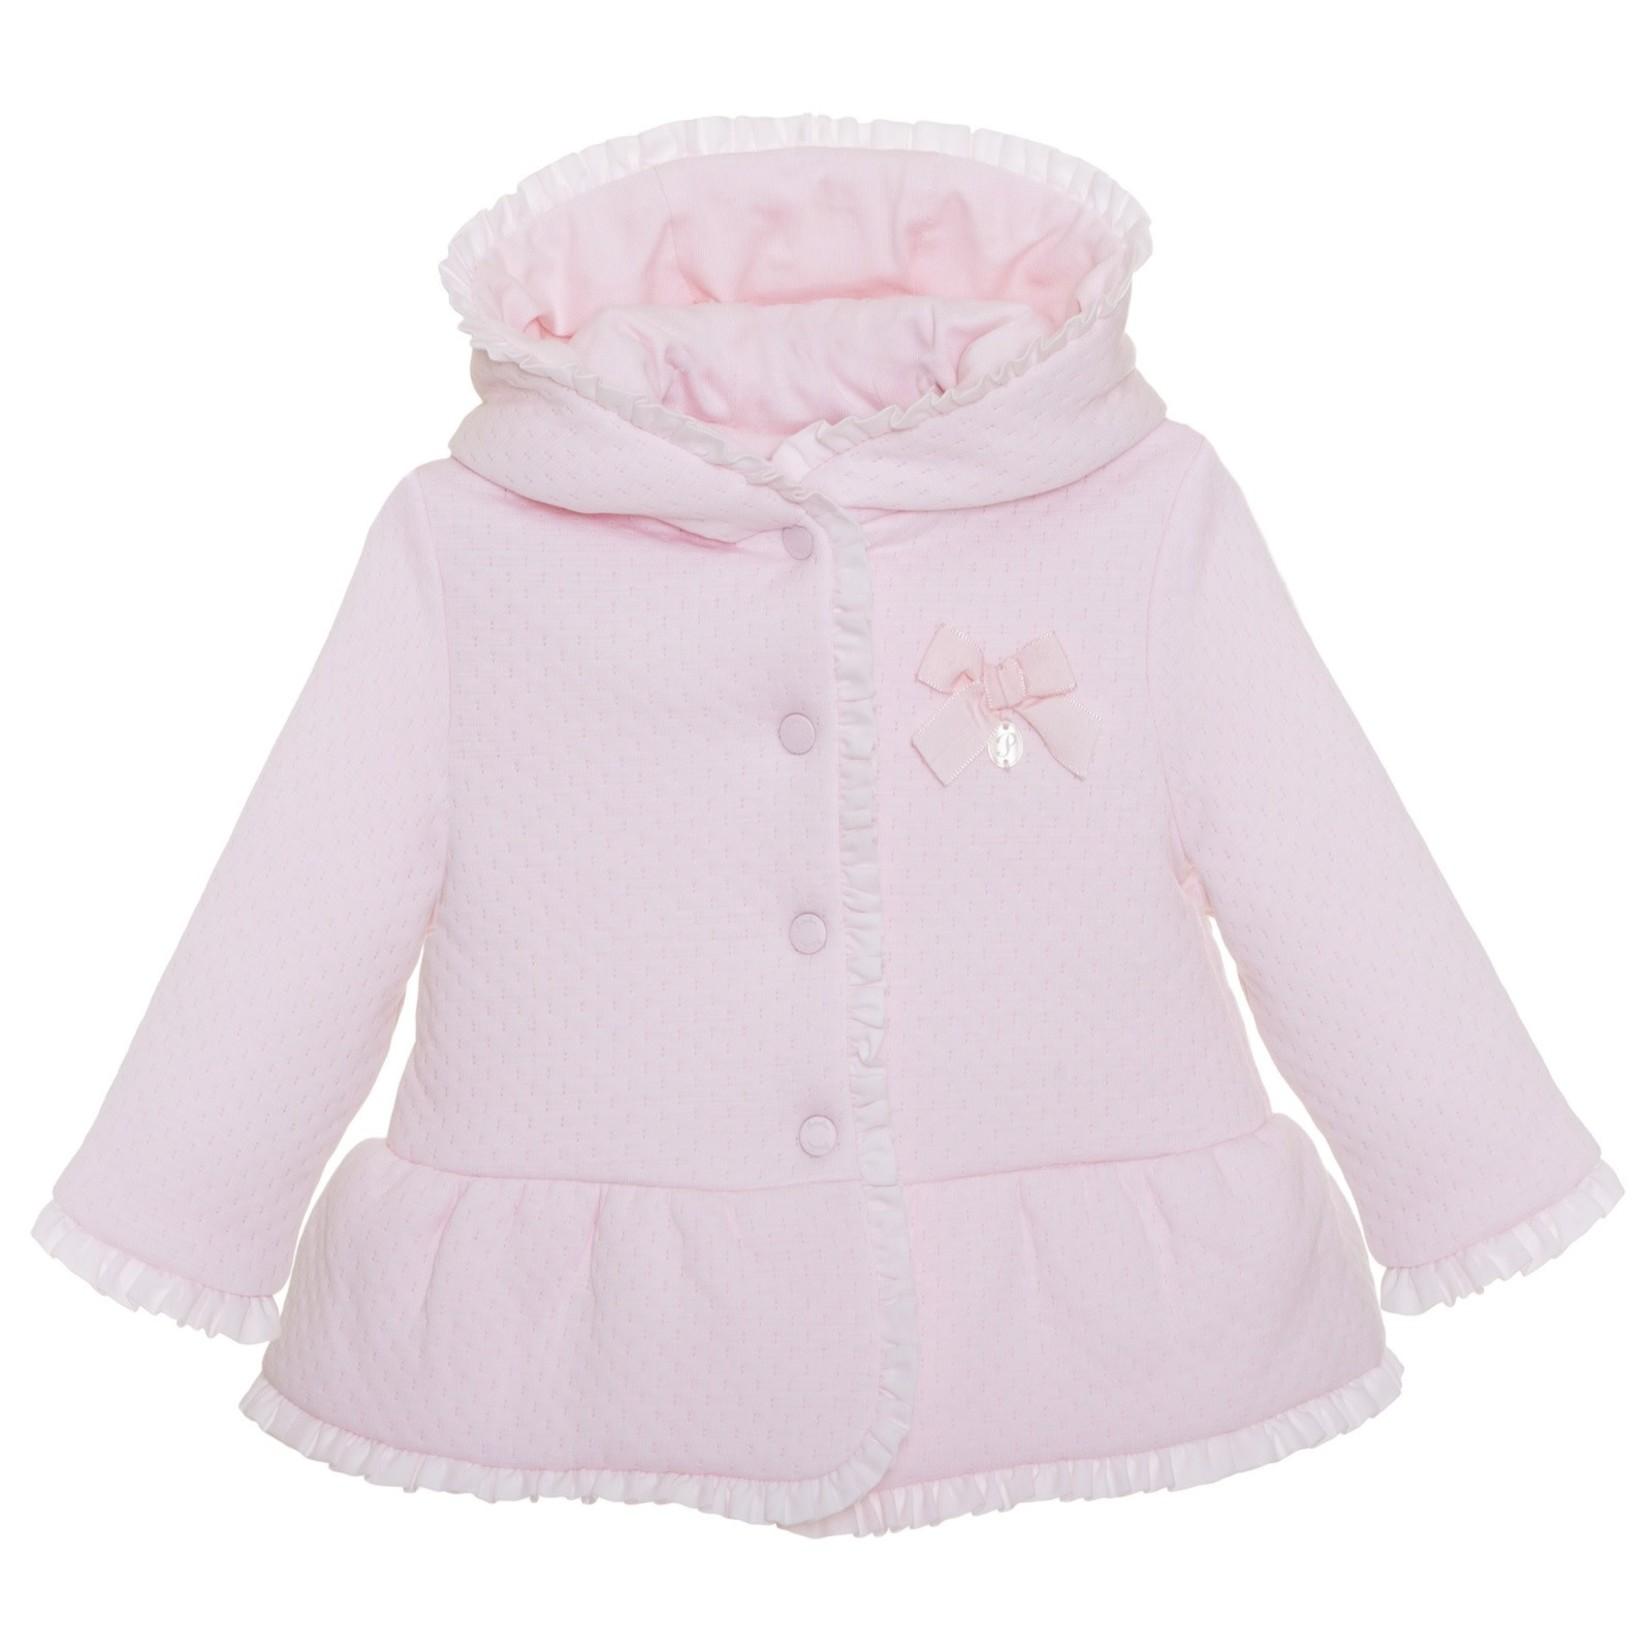 Patachou Newborn Coat - Patachou